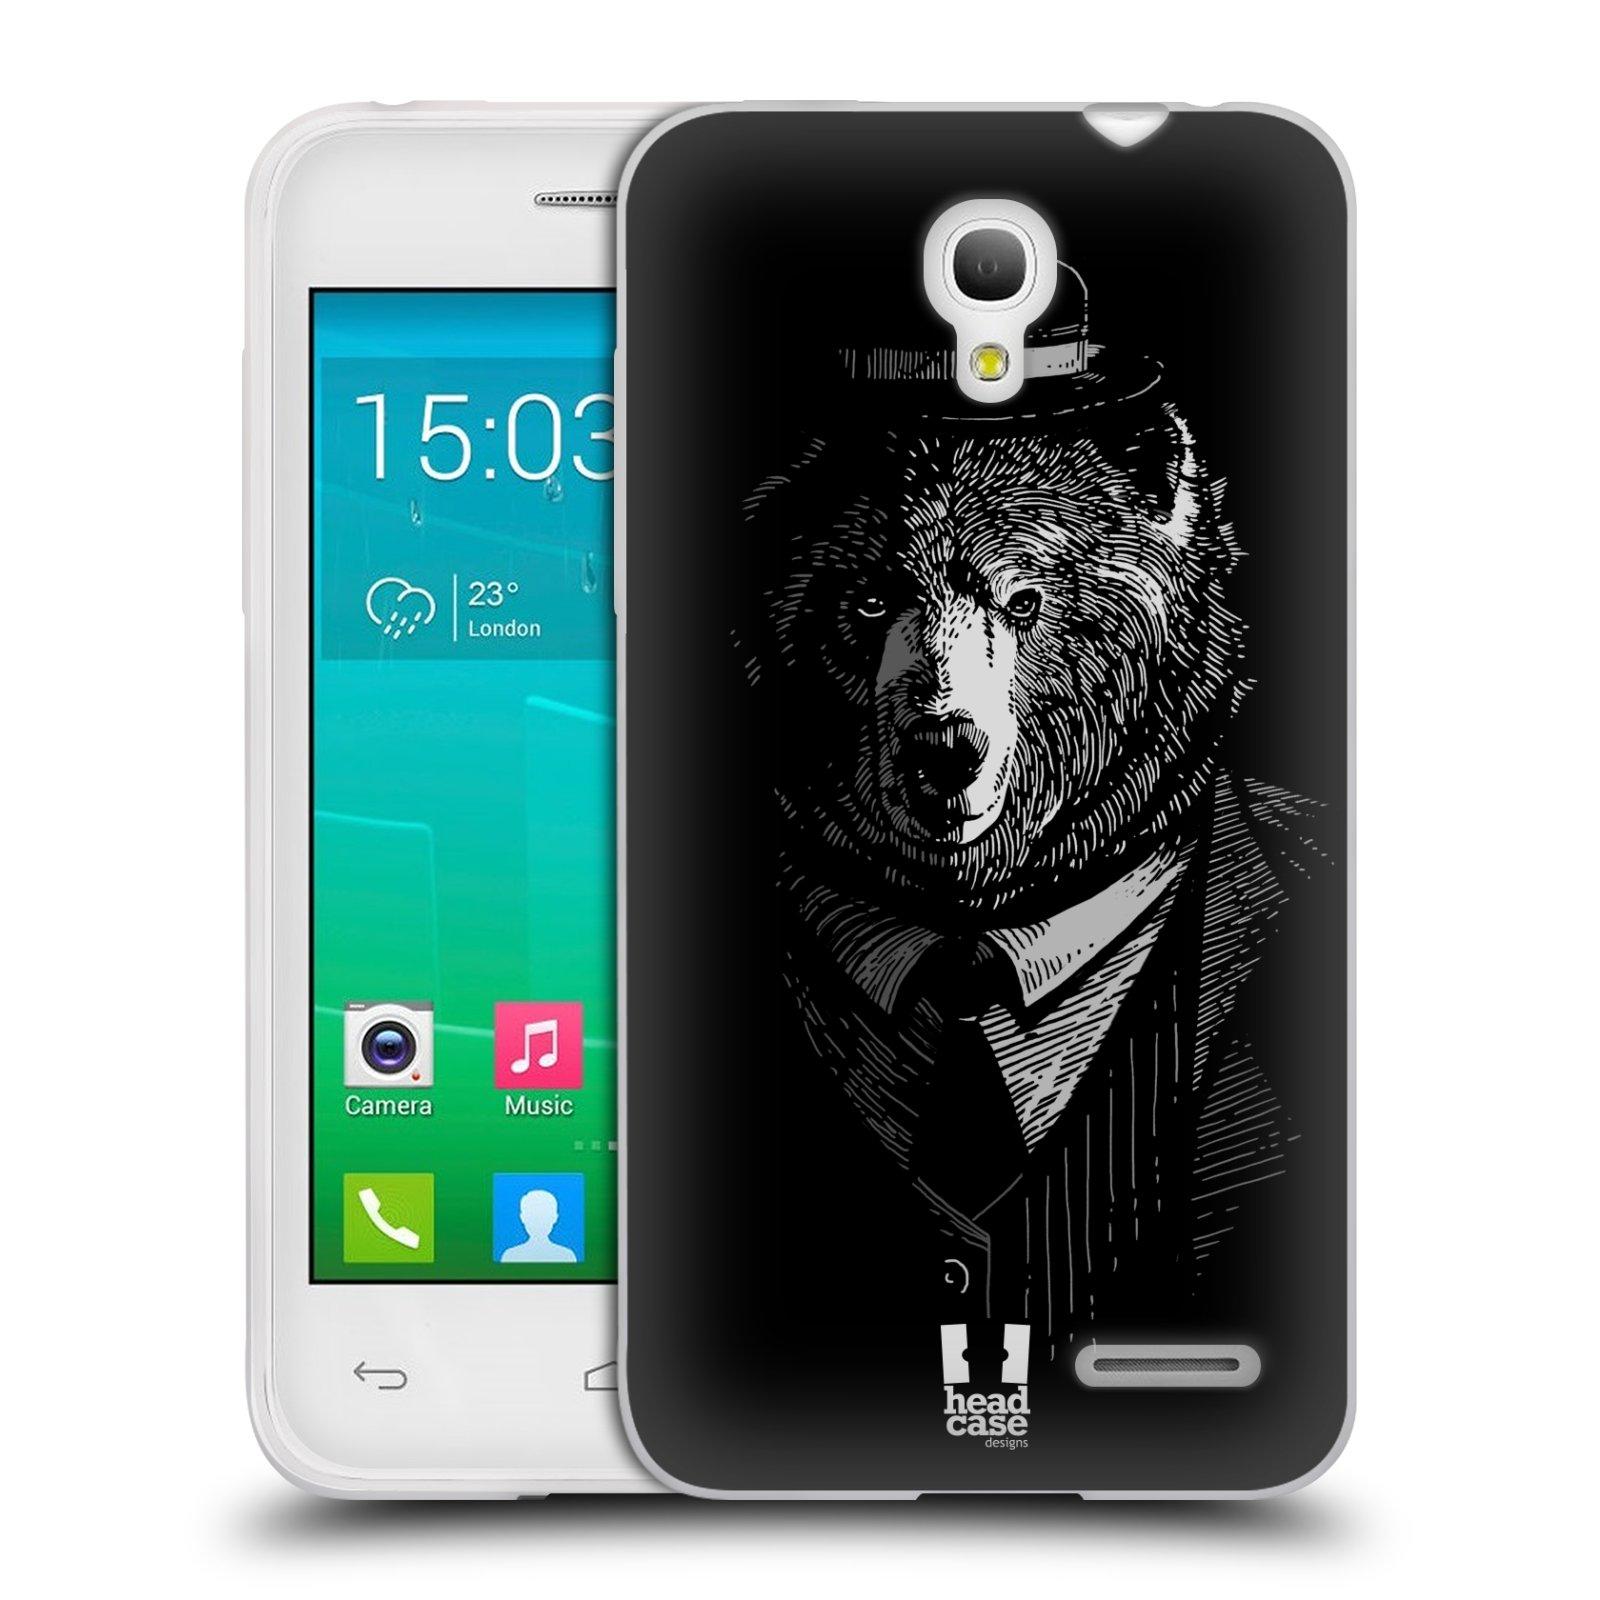 HEAD CASE silikonový obal na mobil Alcatel POP S3 OT-5050Y vzor Zvíře v obleku medvěd